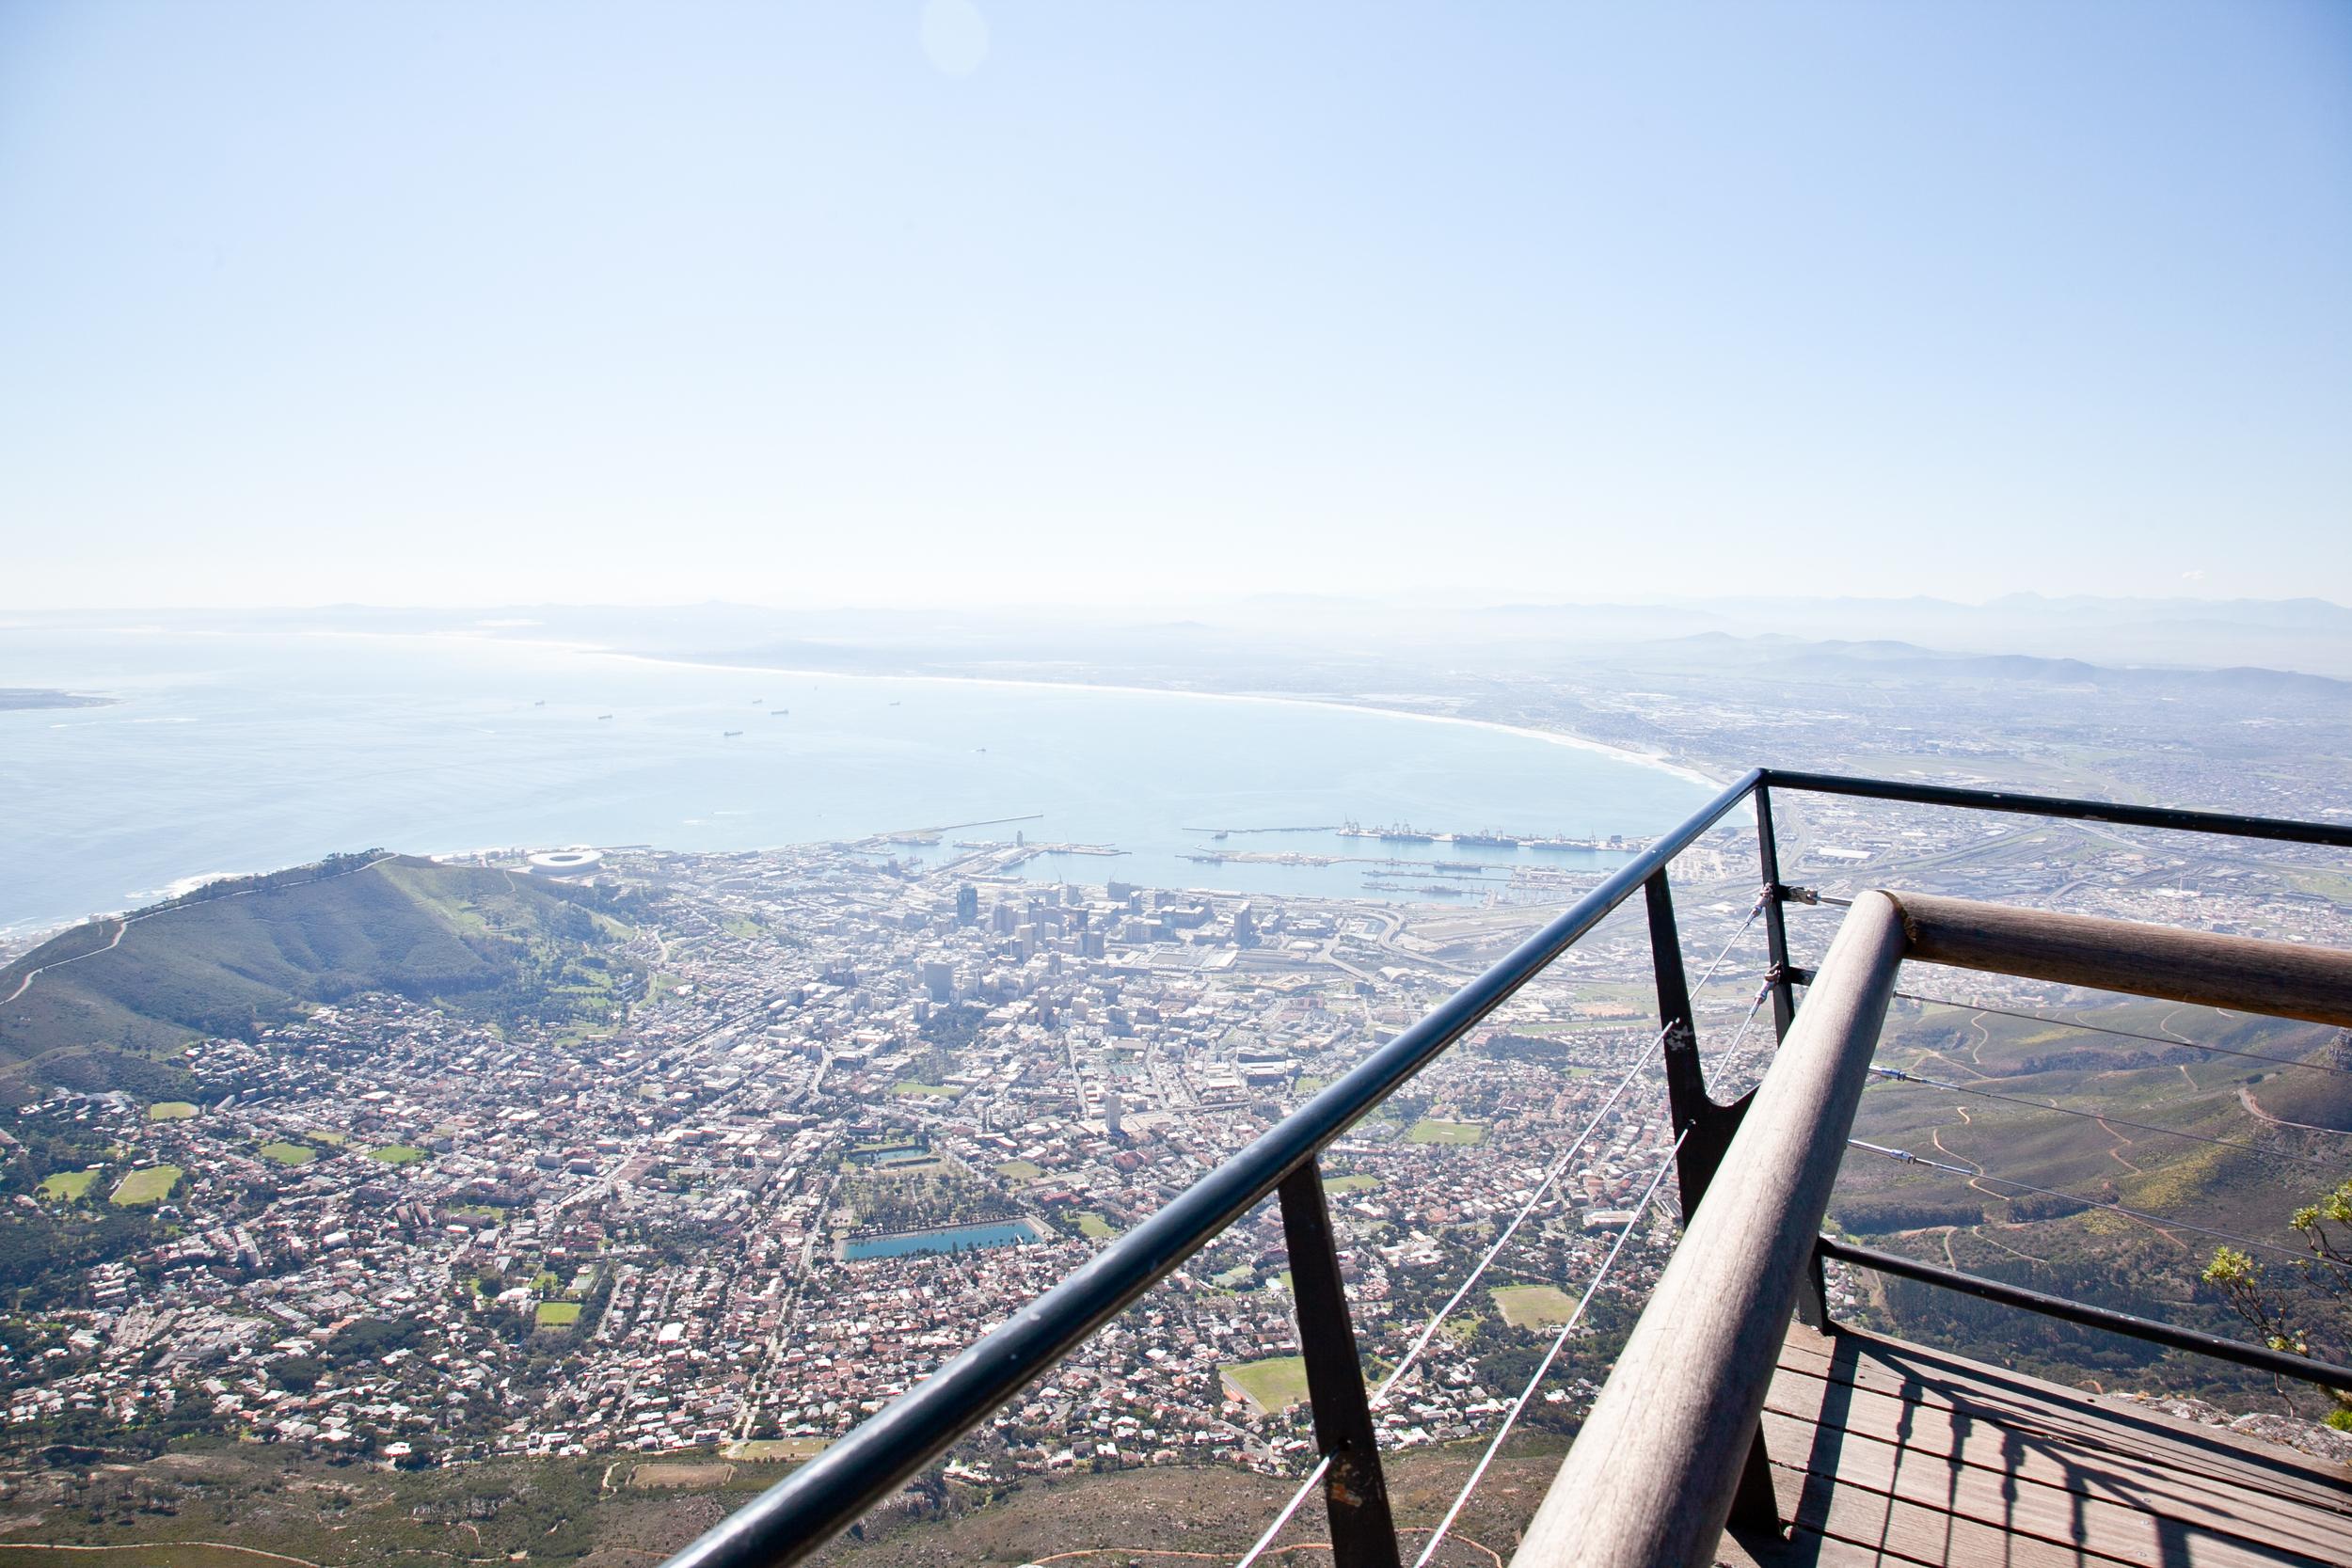 IMG_4676-table-mountain-cape-town-south-africa-trisa-taro.jpg